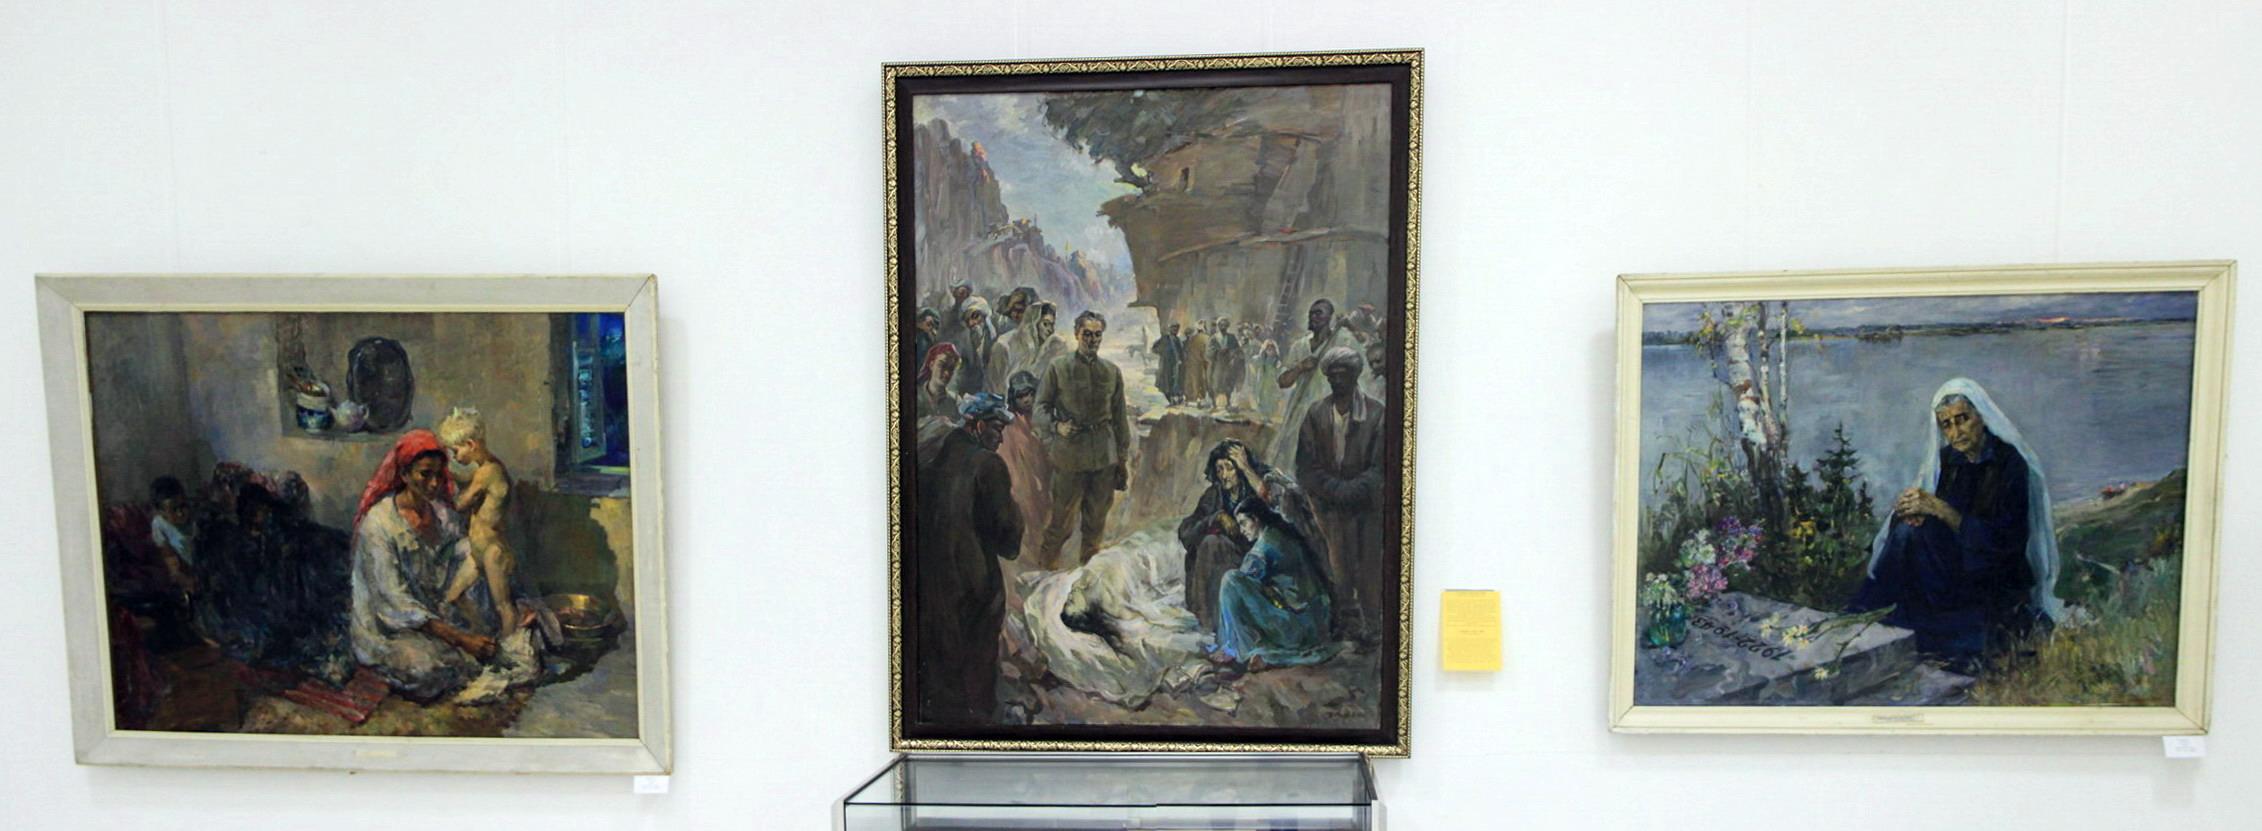 Лев Резников Экспозиция картин. 08. 2018